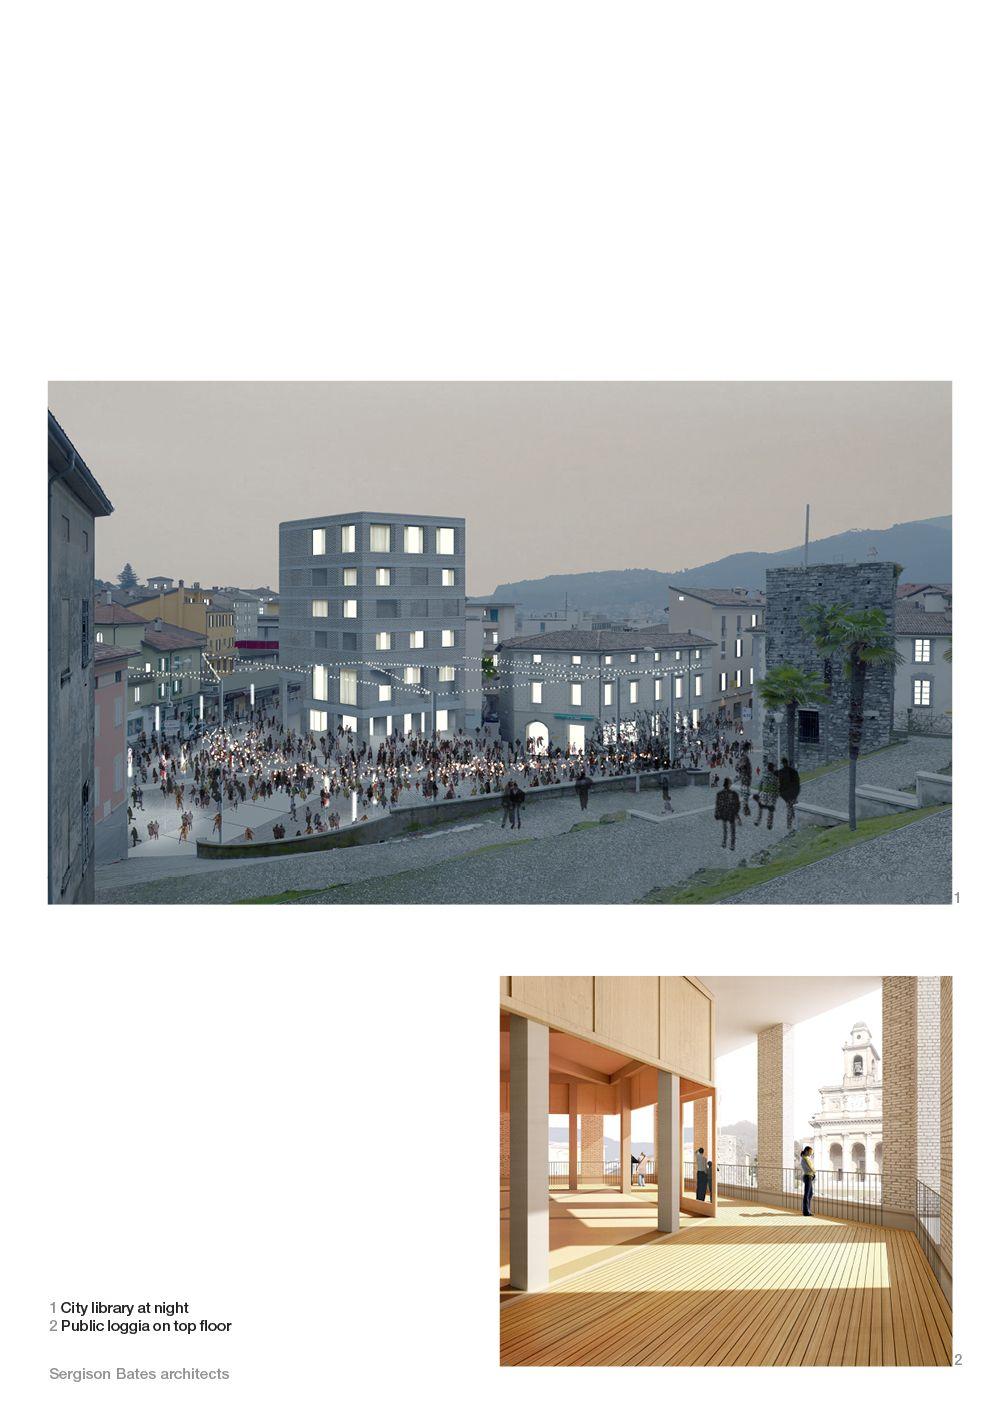 New City Library, Mendrisio | Sergison Bates architects